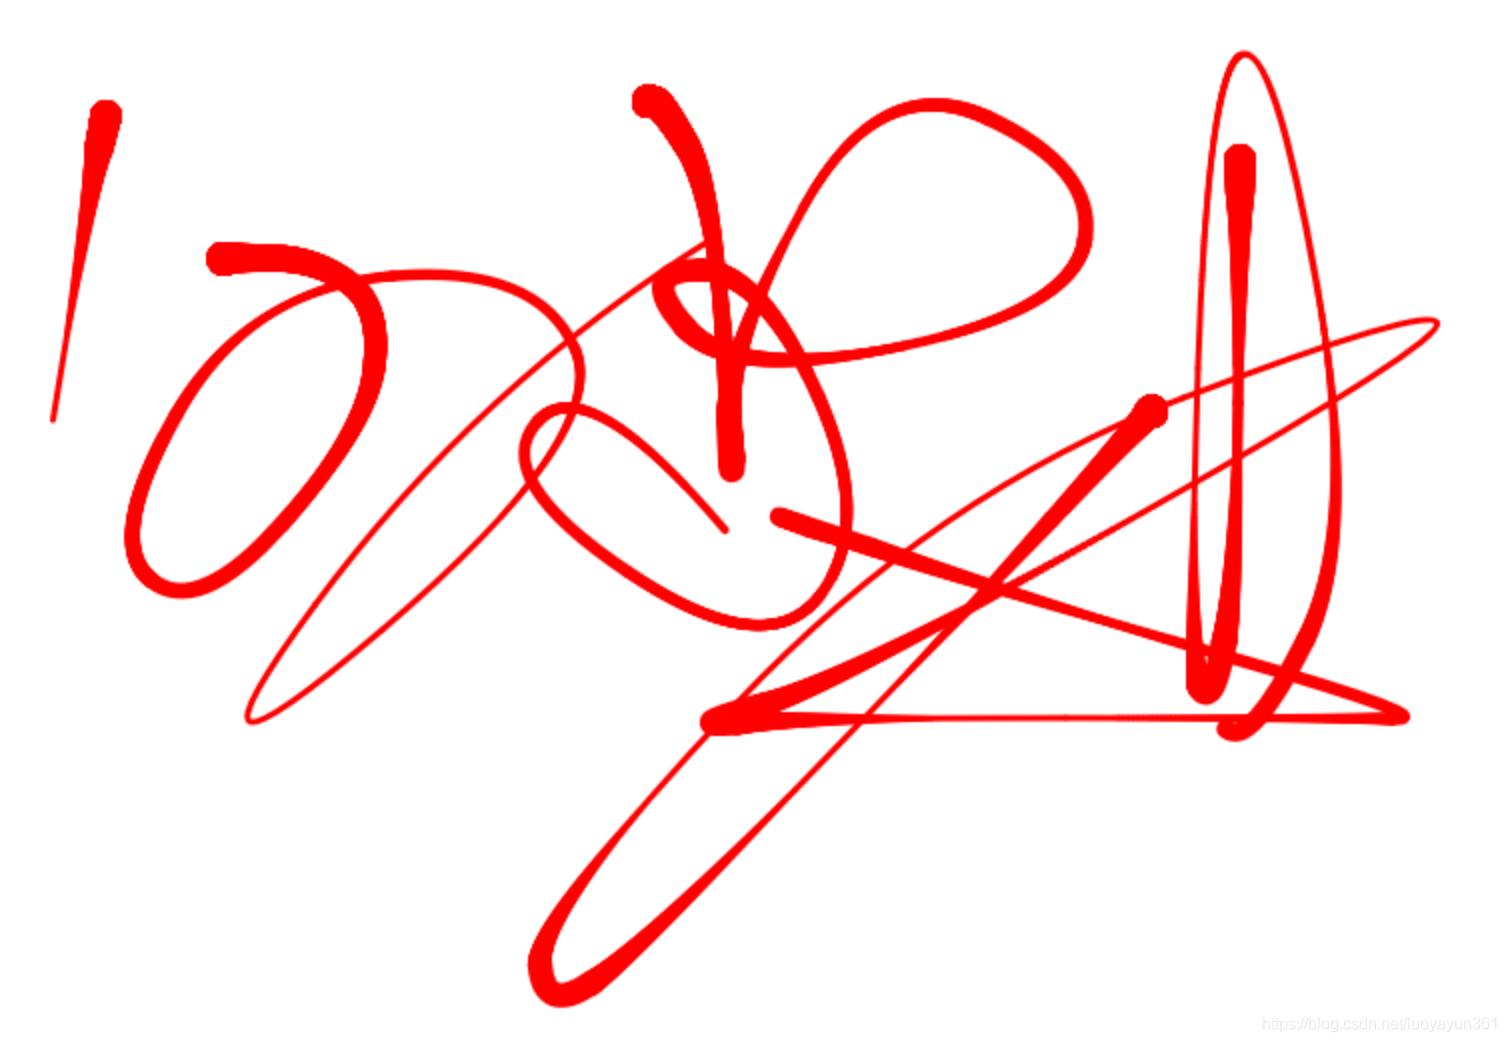 Qt 实现钢笔画线效果详细原理